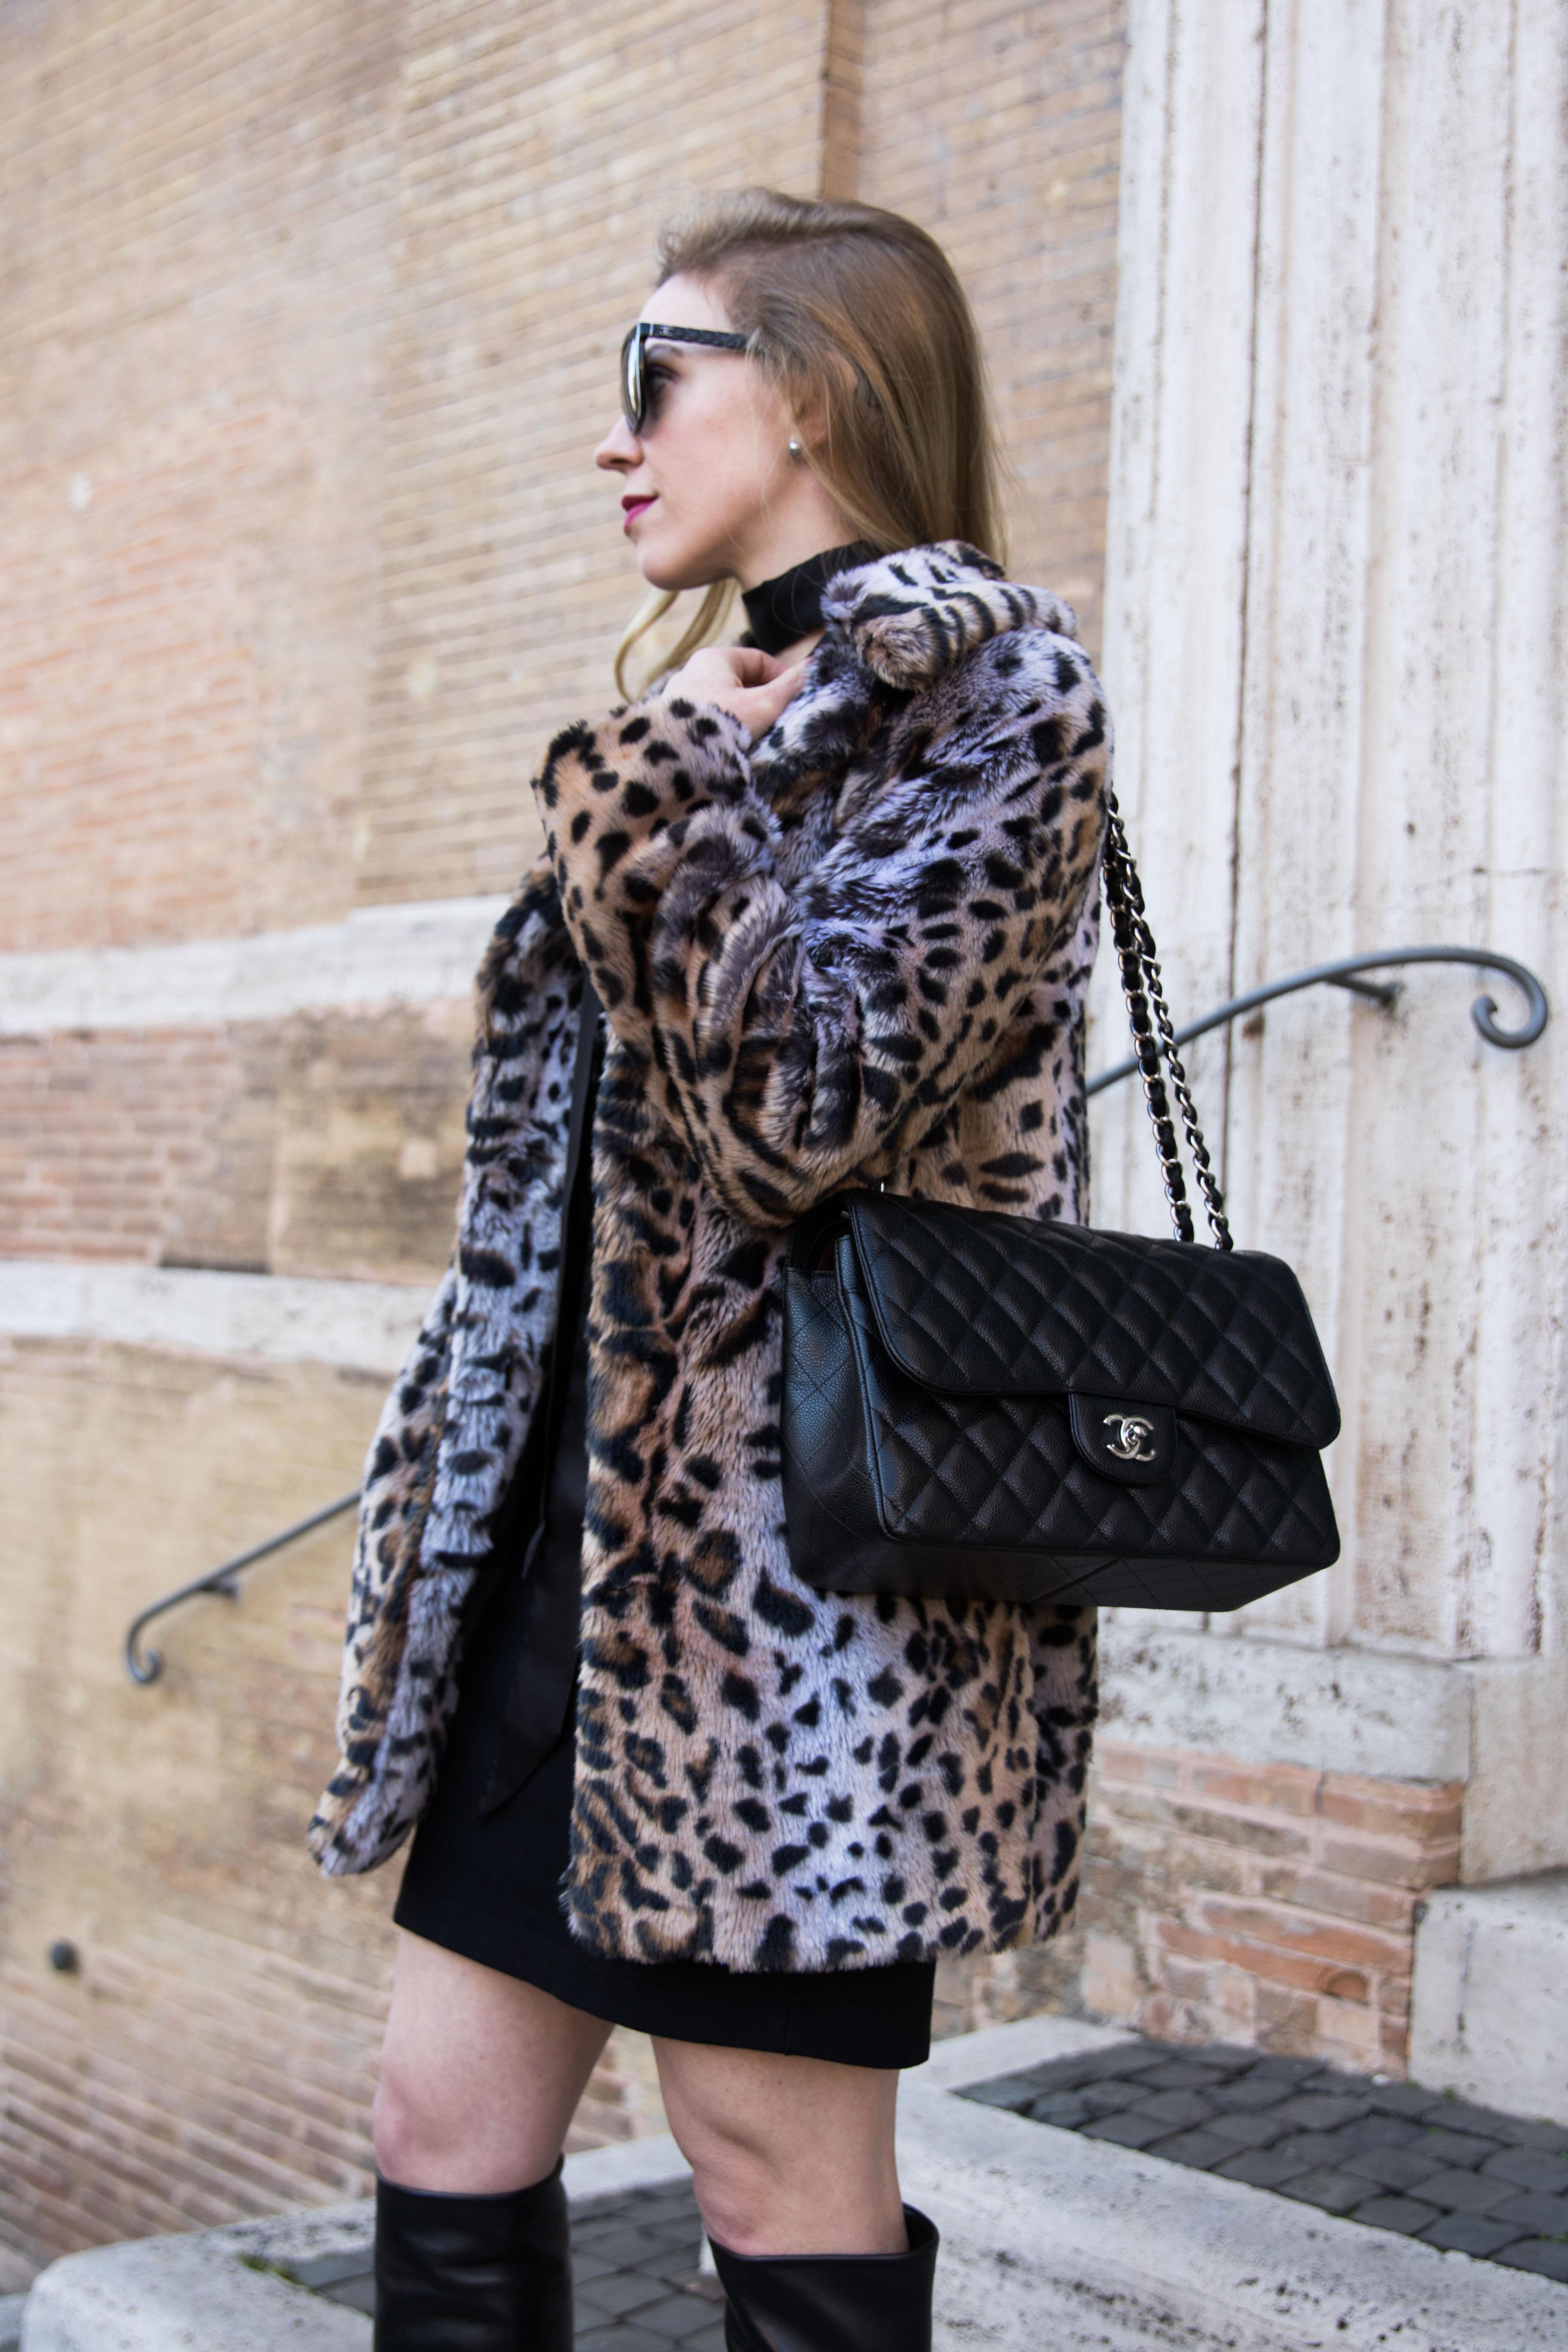 fashion-blogger-meagan-brandon-of-meagans-moda-wearing-faux-fur-leopard-coat-wtih-chanel-jumbo-flap-bag